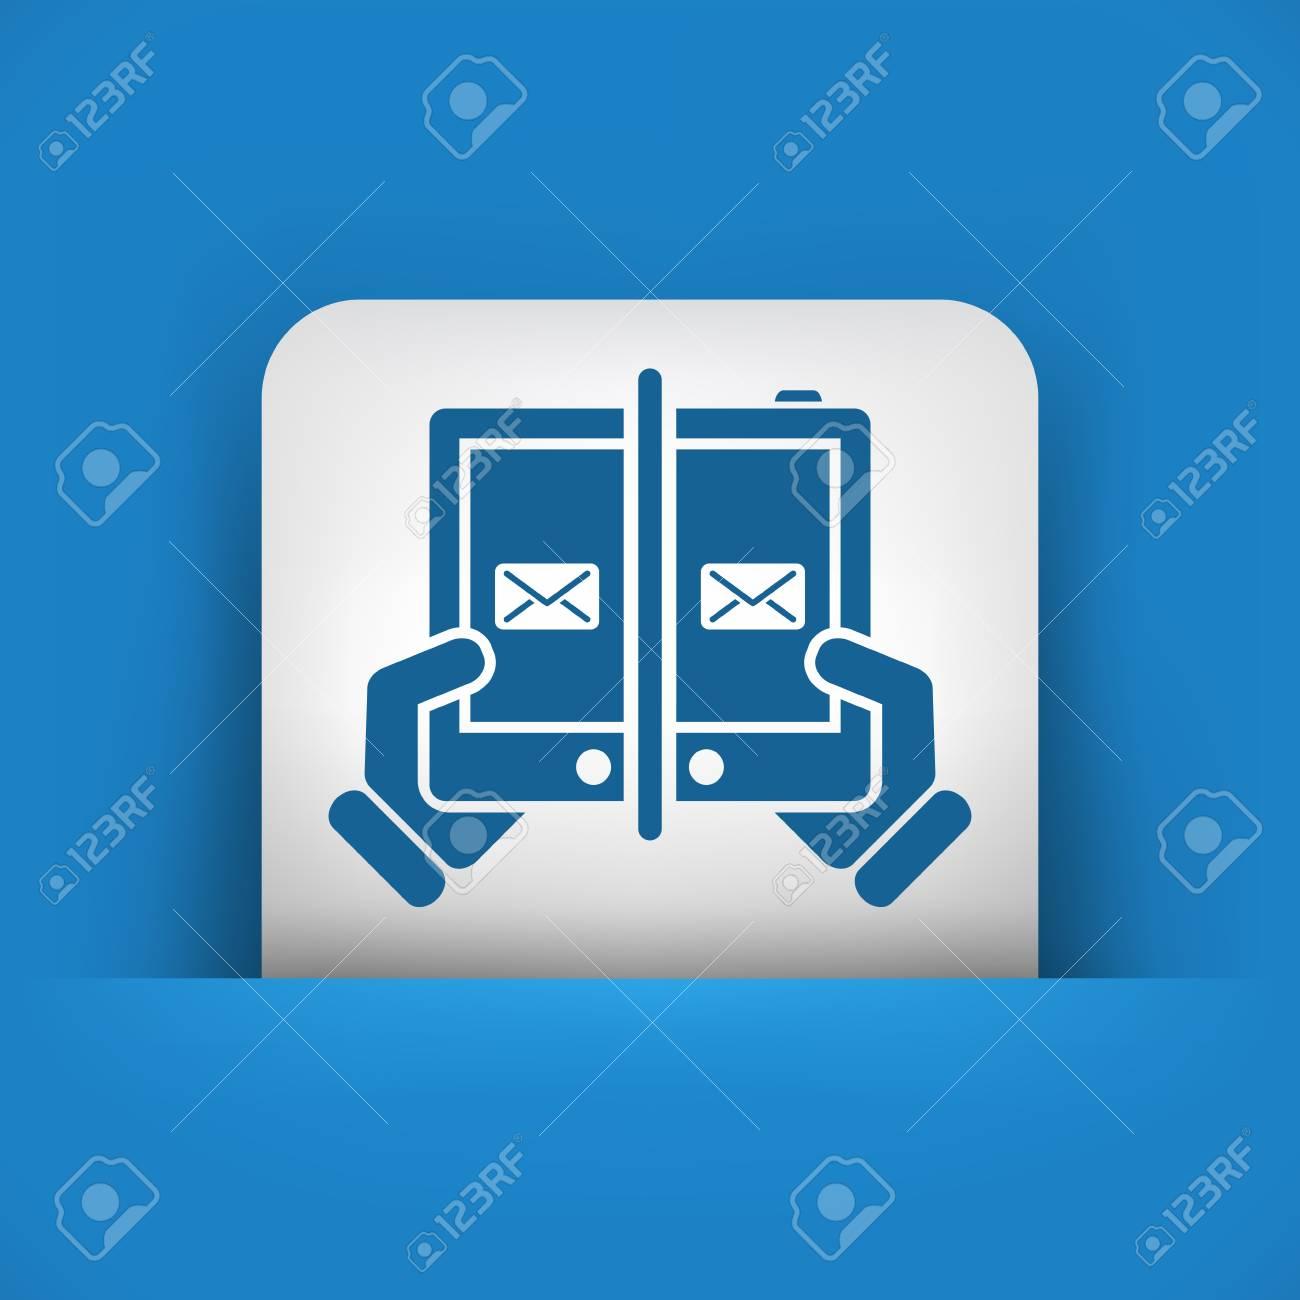 Web message icon Stock Vector - 22783478